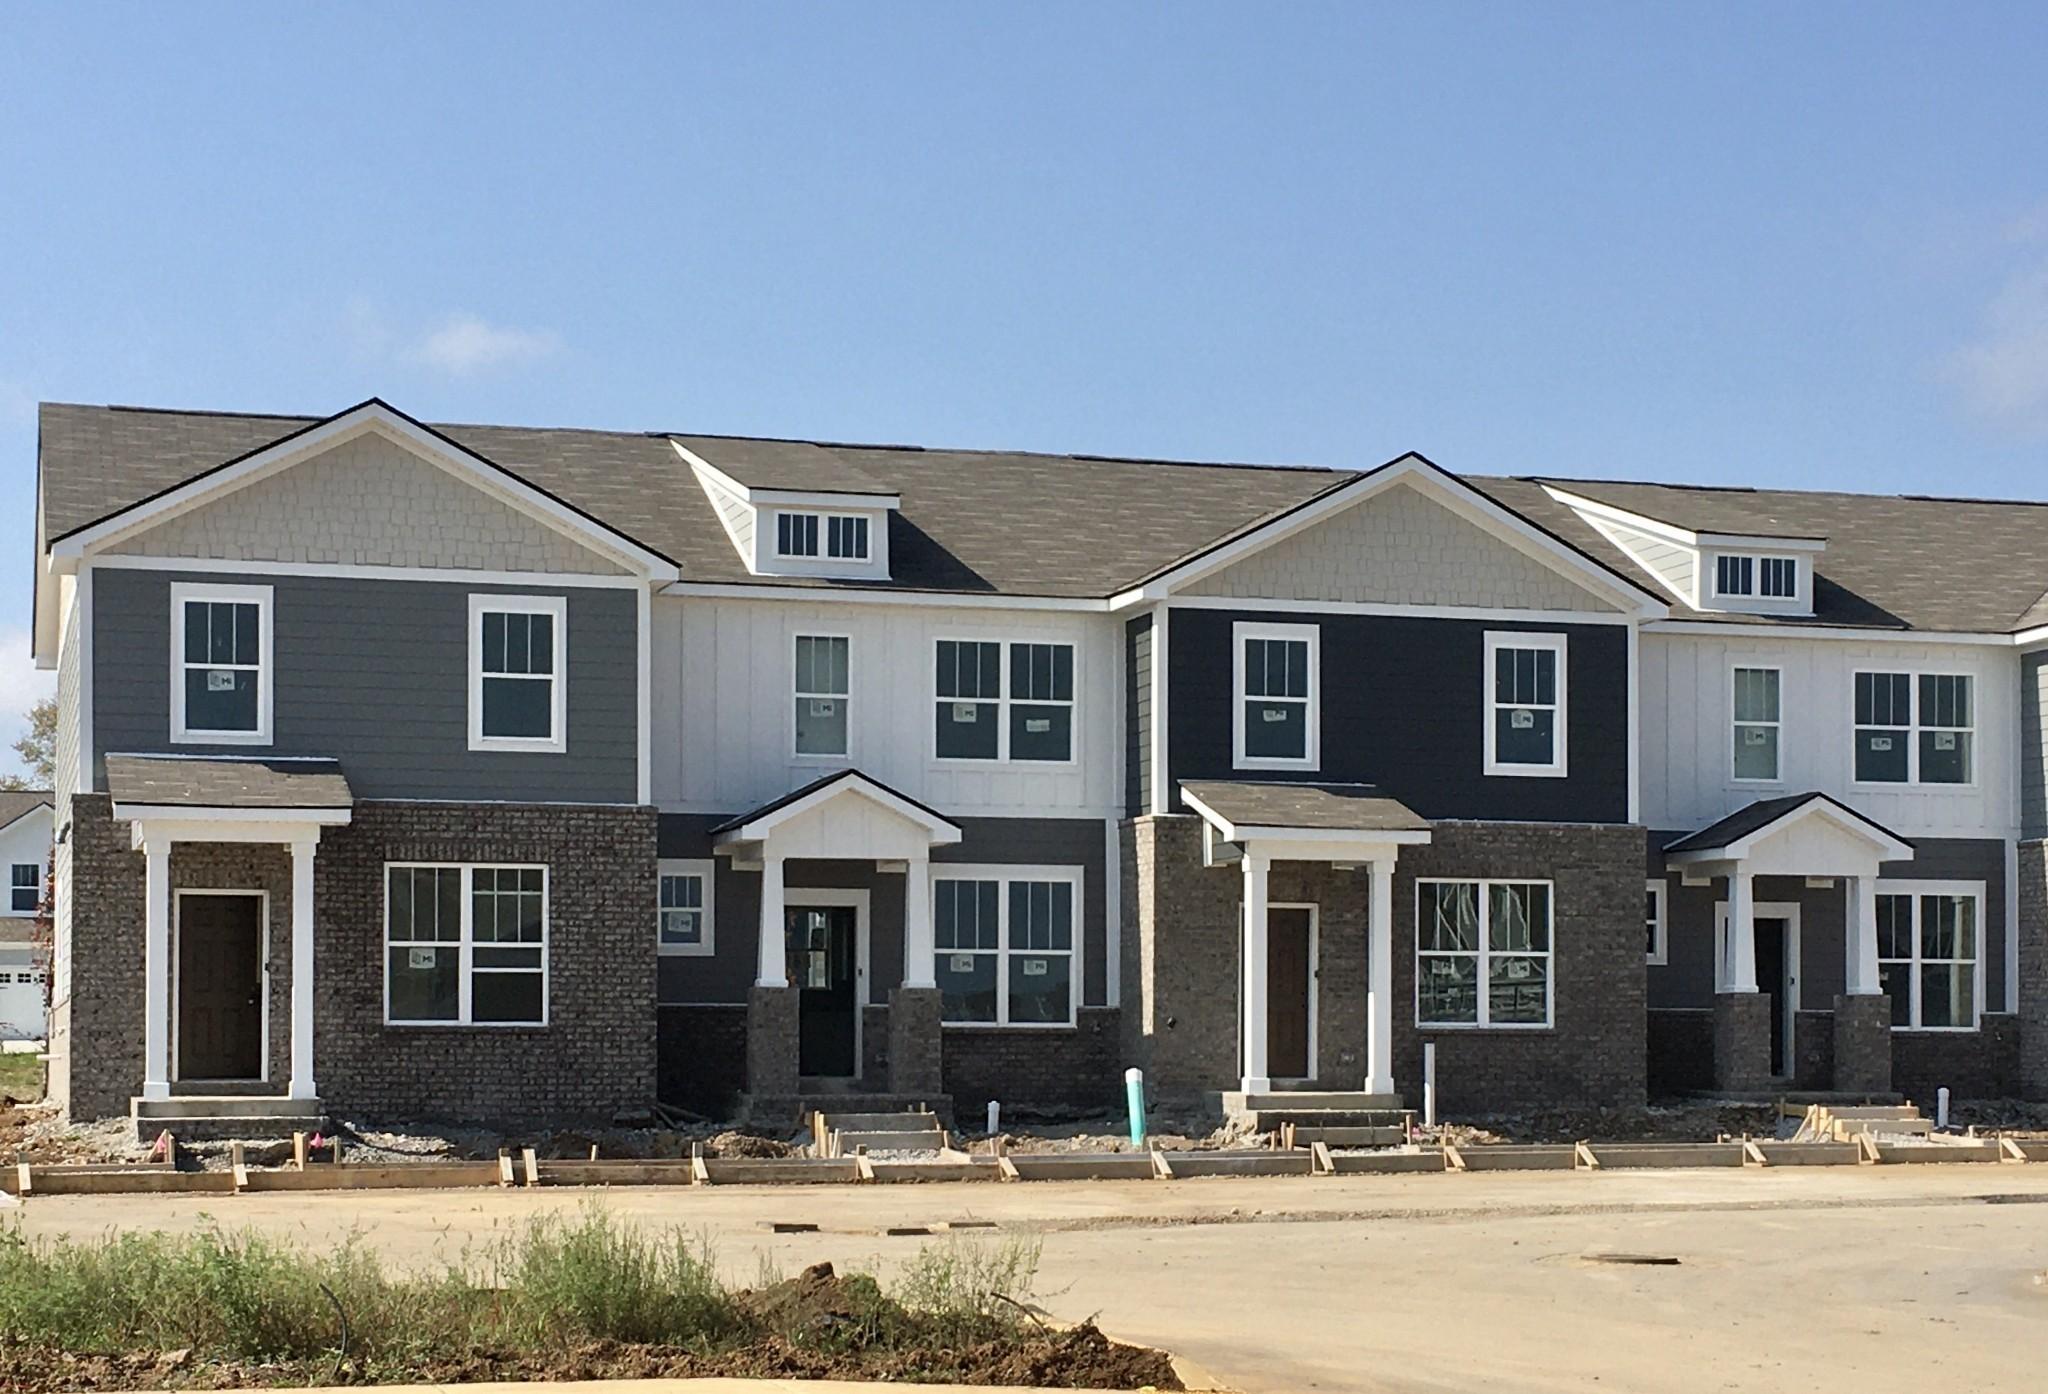 1715 Frodo Way (144 S) Property Photo - Murfreesboro, TN real estate listing